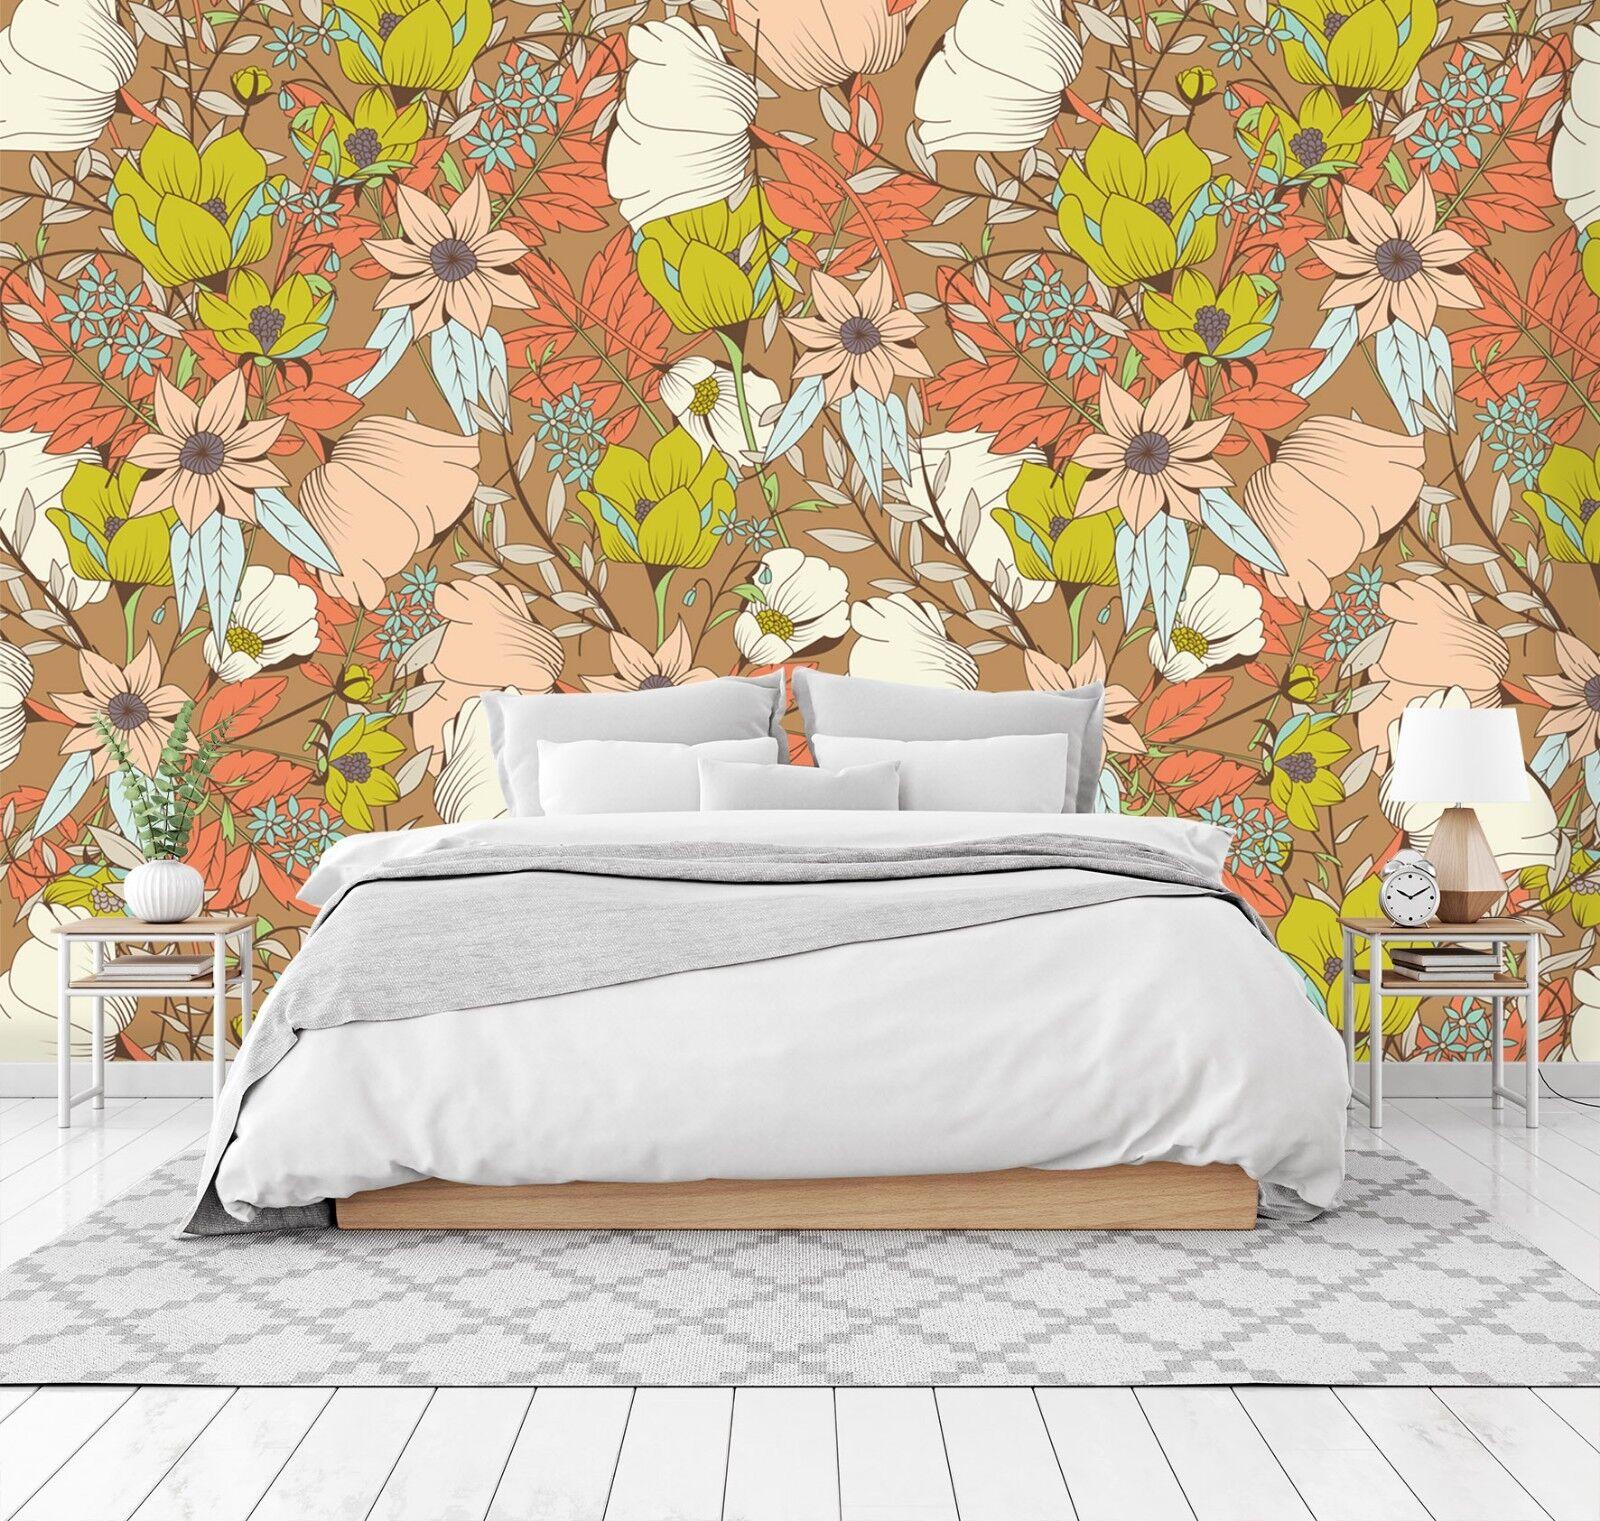 3D Orange Flower 733 Wall Paper Print Wall Decal Deco Indoor Wall Murals US